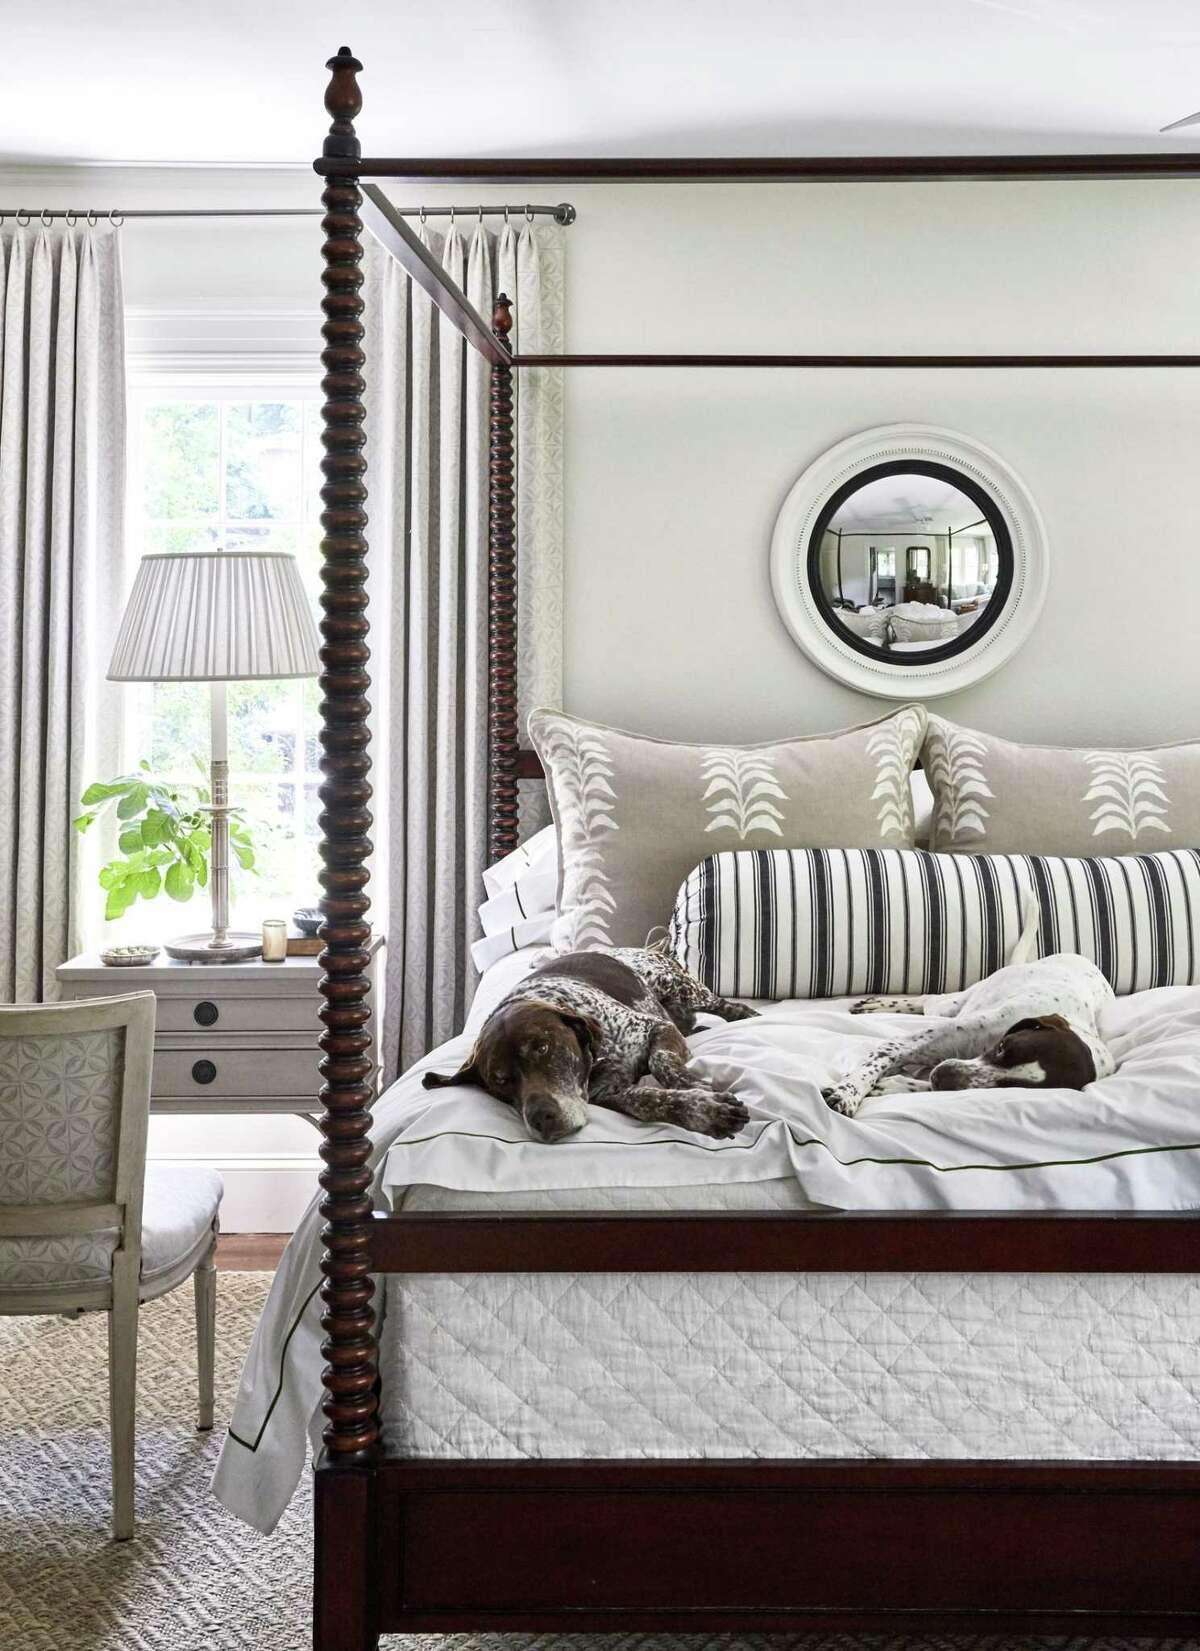 Above, he restful Birmingham bedroom of designer Heather Chadduck Hillegas. Left, an open air meditation space designed by Ohara Davies- Gaetano